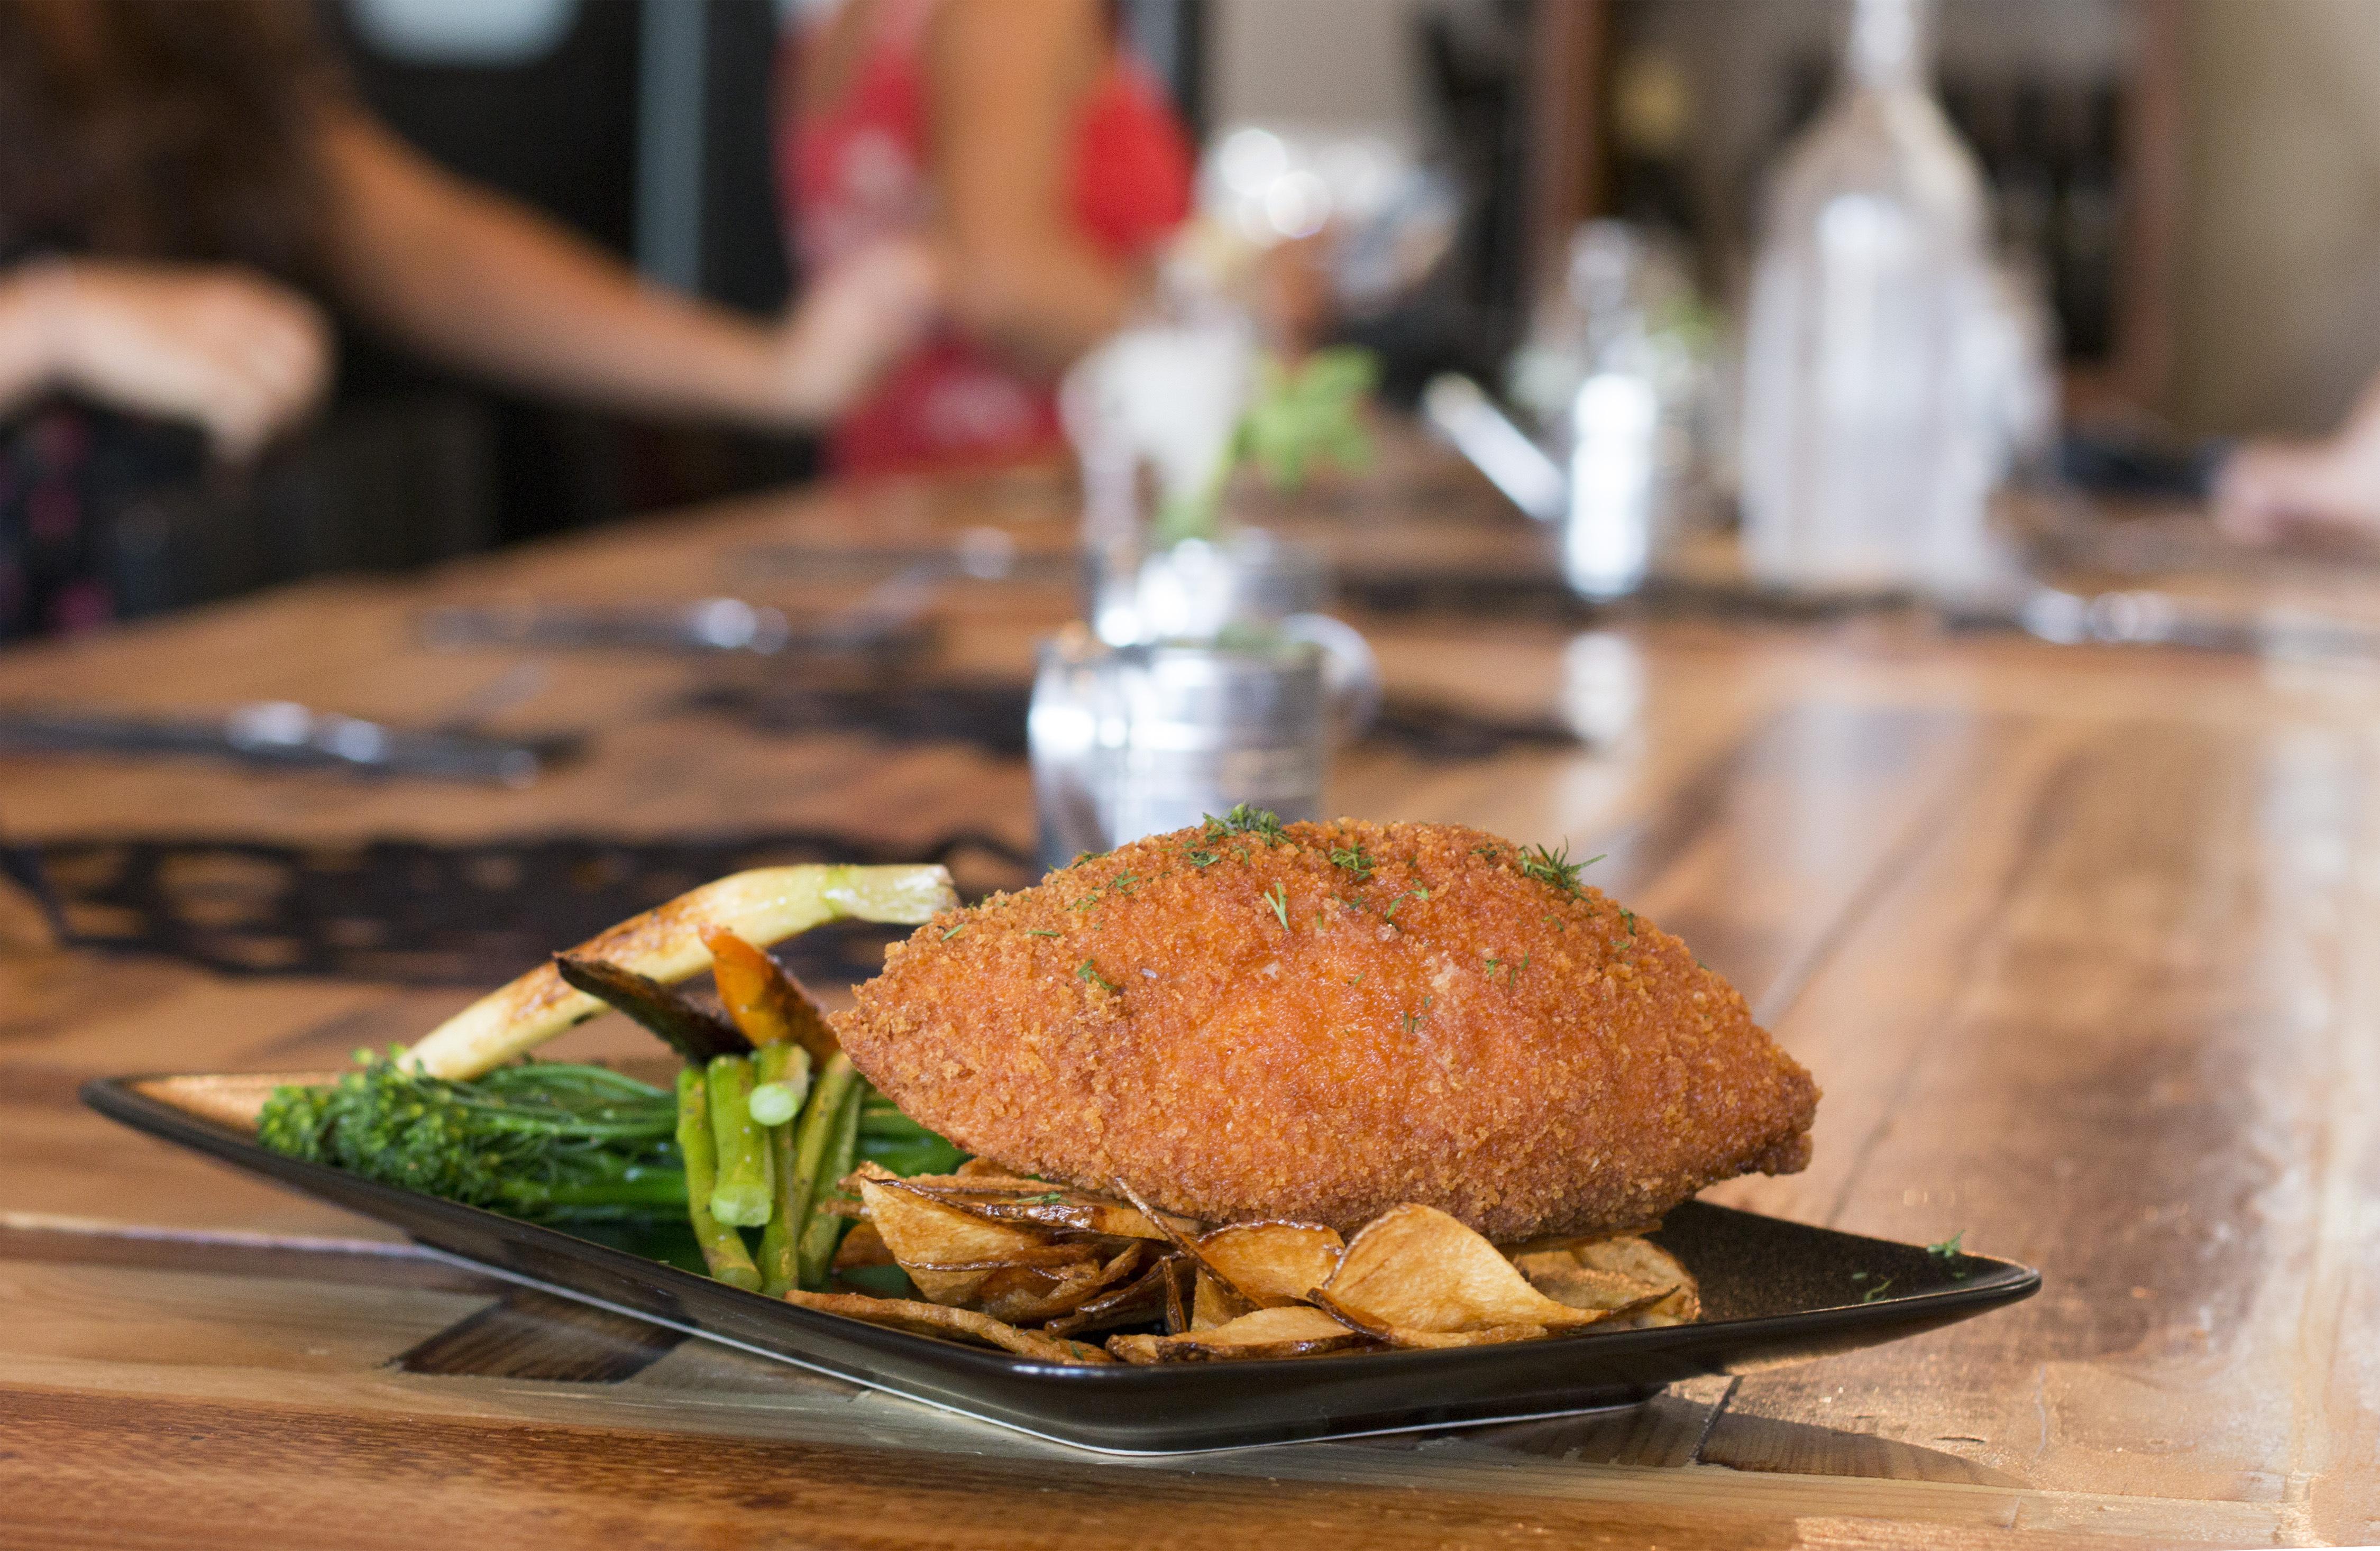 i8tonite with Manhattan Beach's Doma Kitchen Chef Kristina Miksyte & Recipe for Borscht